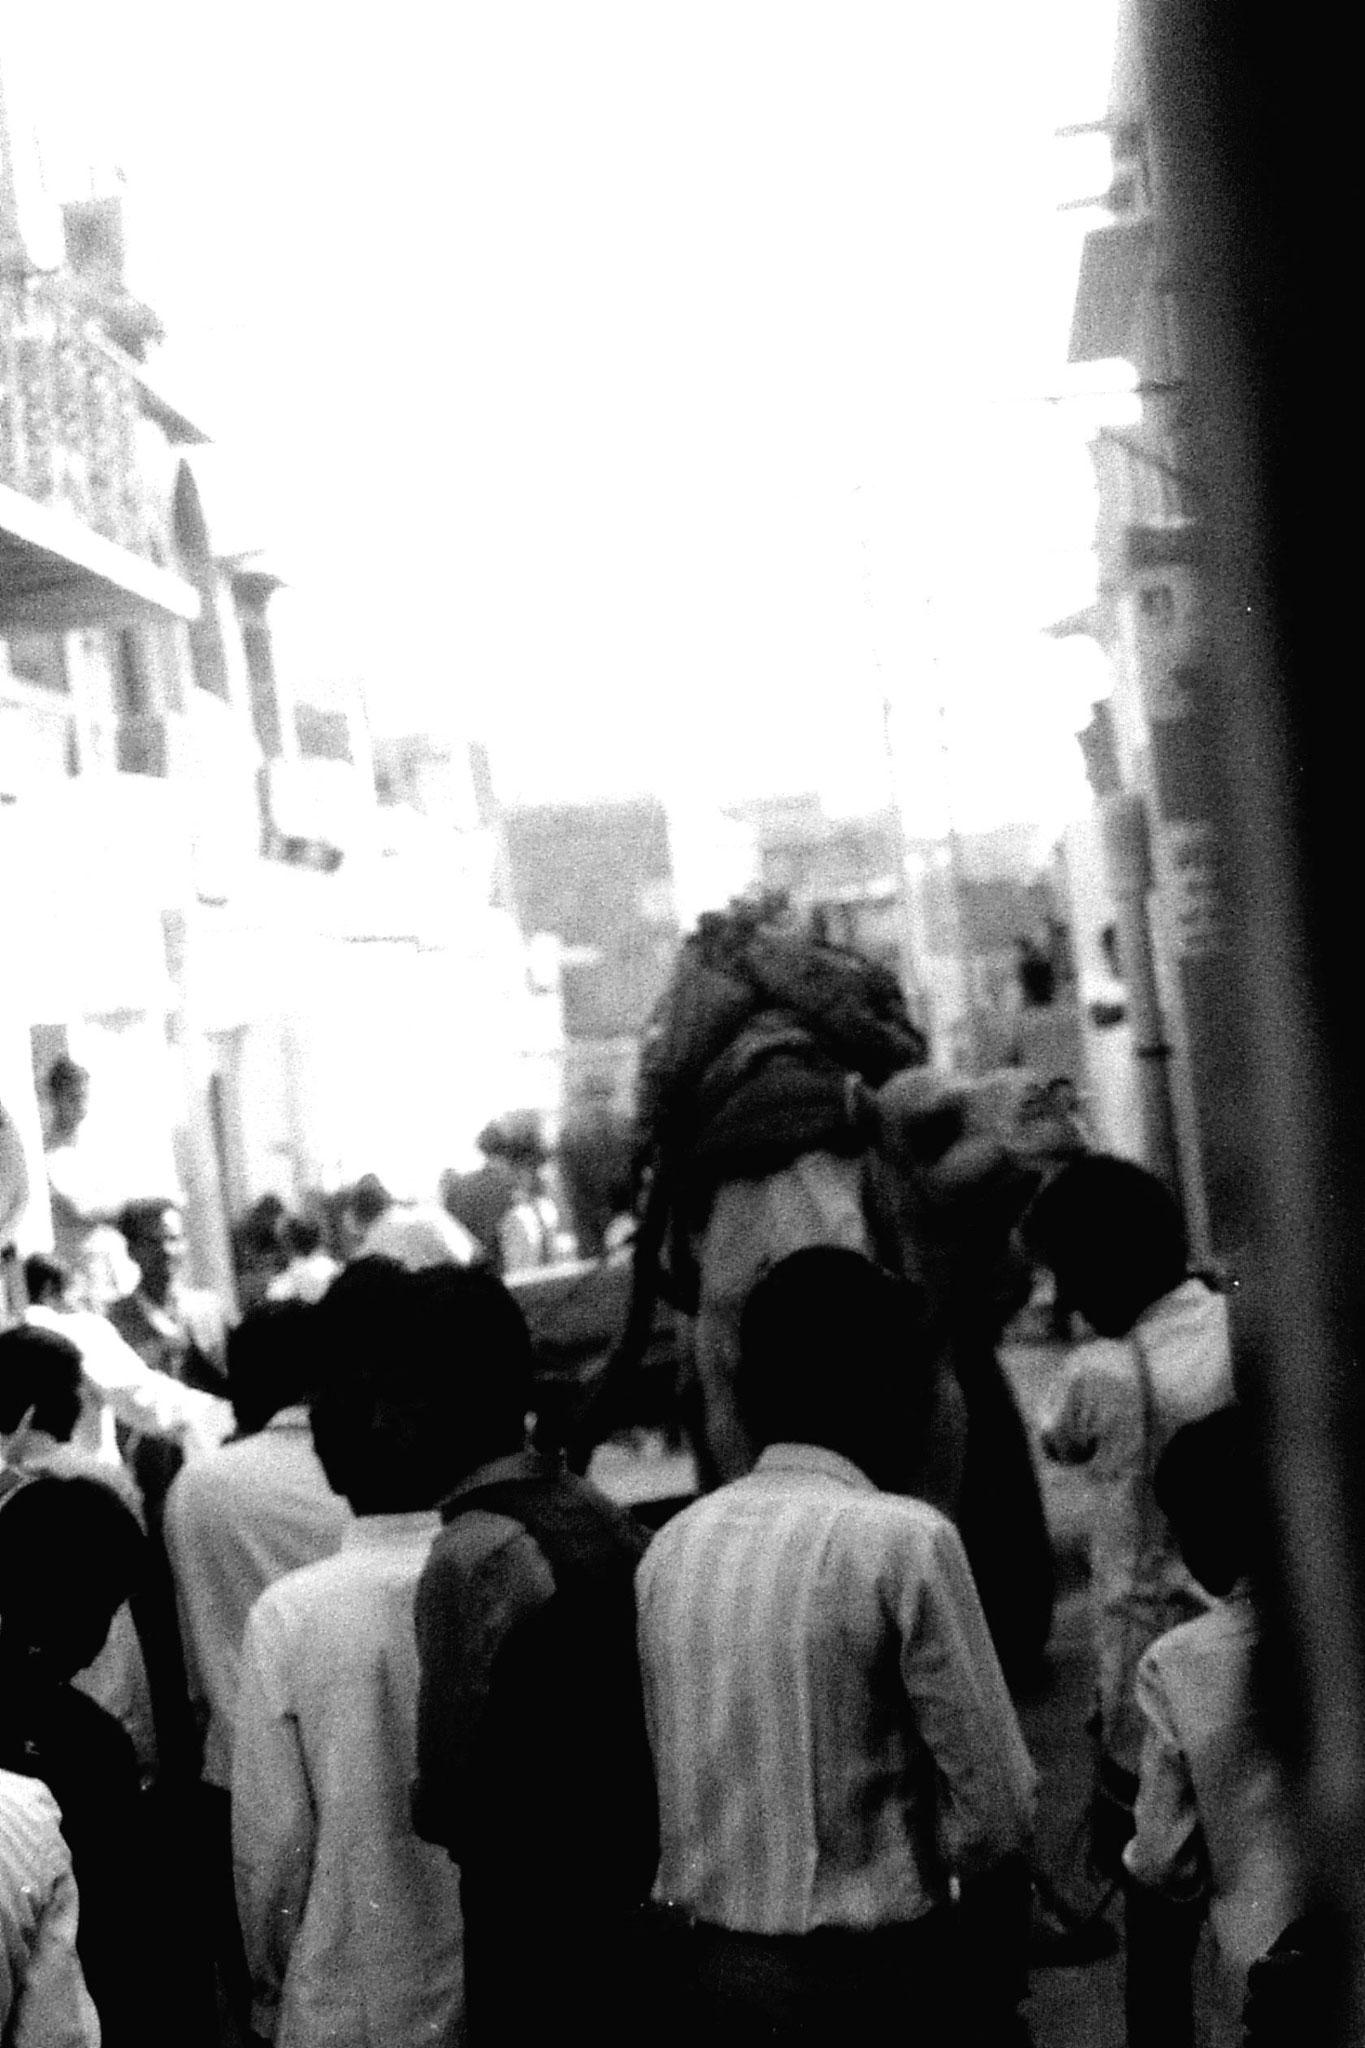 3/12/1989: 33: Jaisalmer camel and wedding procession